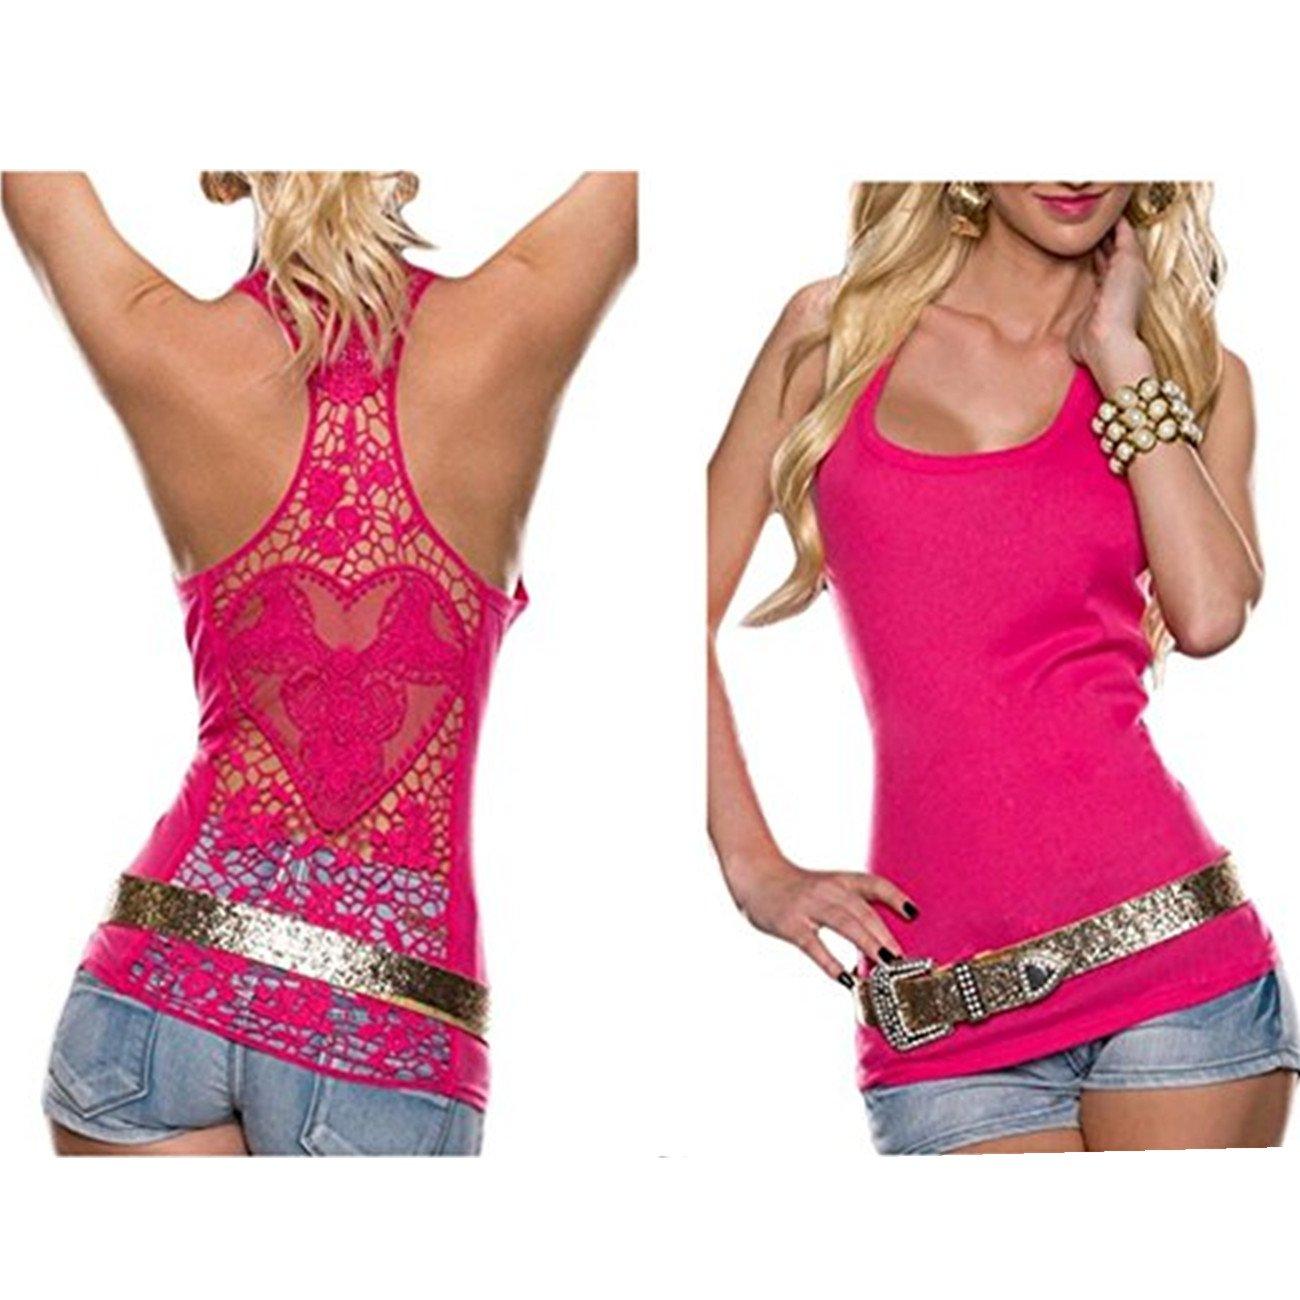 Women Crochet Hollow Out Lace Back Tank Top Clubwear Halter Camisole FIST BUMP